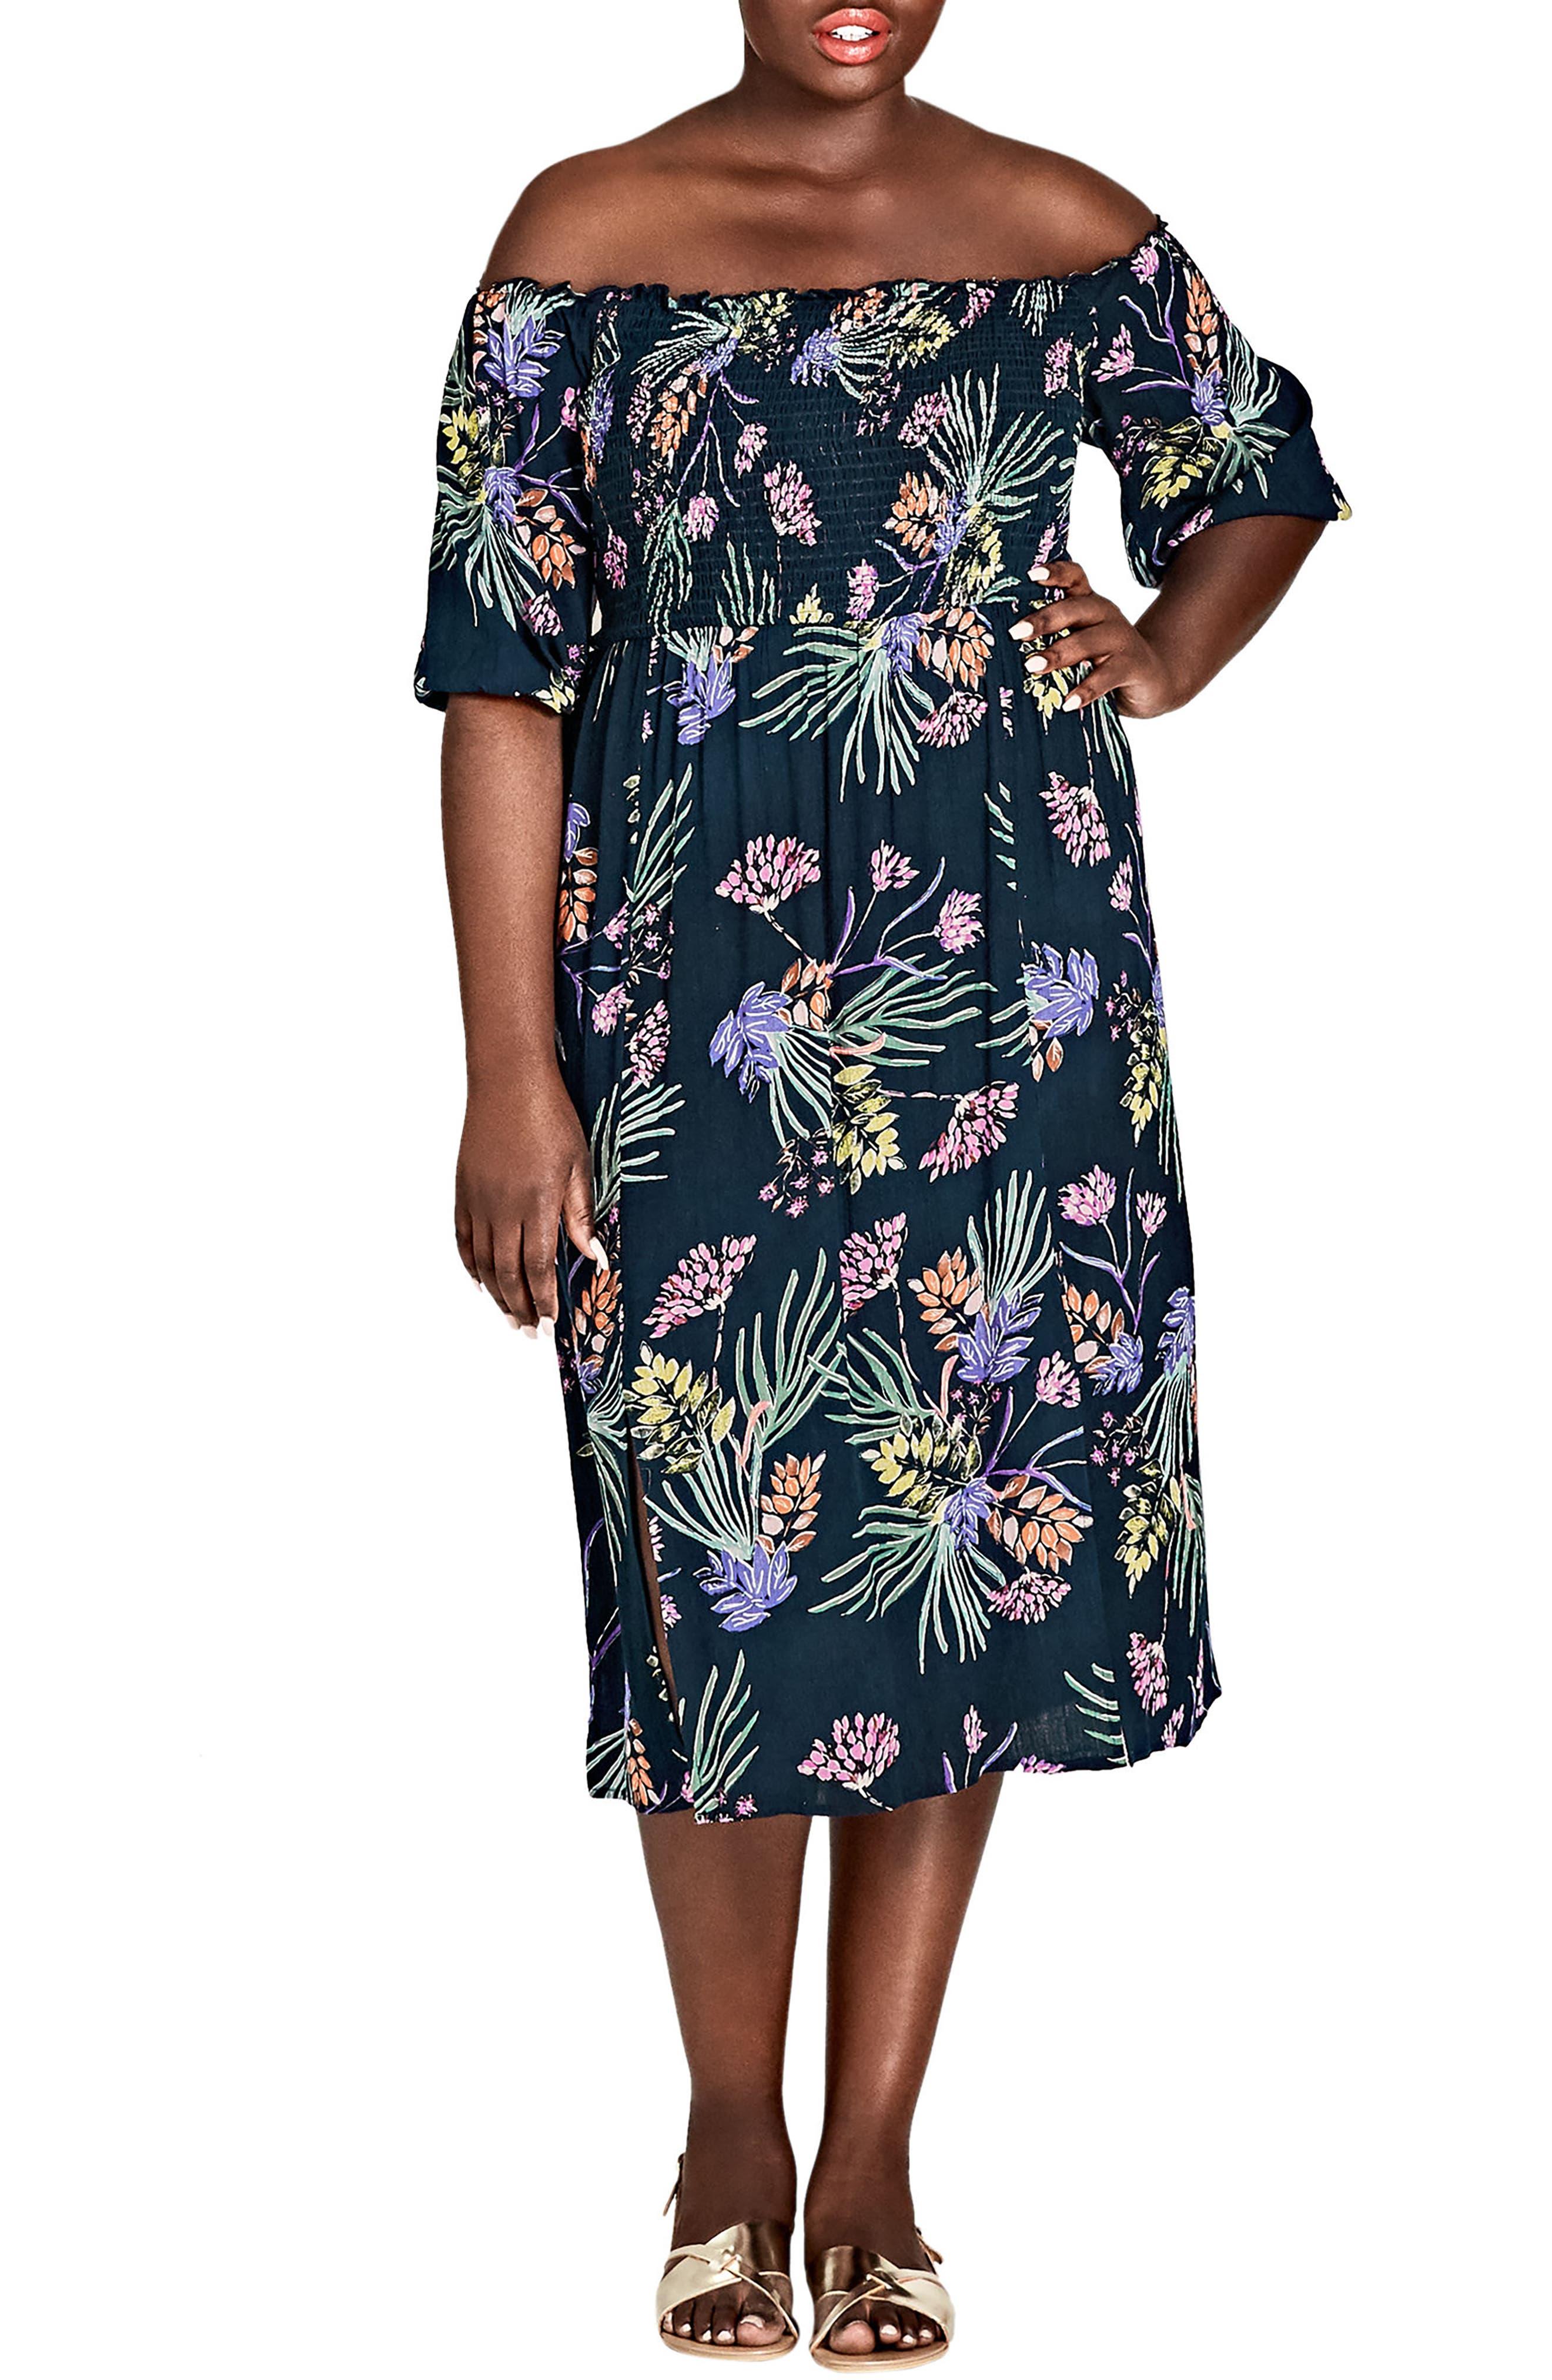 Island Floral Off the Shoulder Midi Dress,                             Main thumbnail 1, color,                             EXOTIC GARDEN